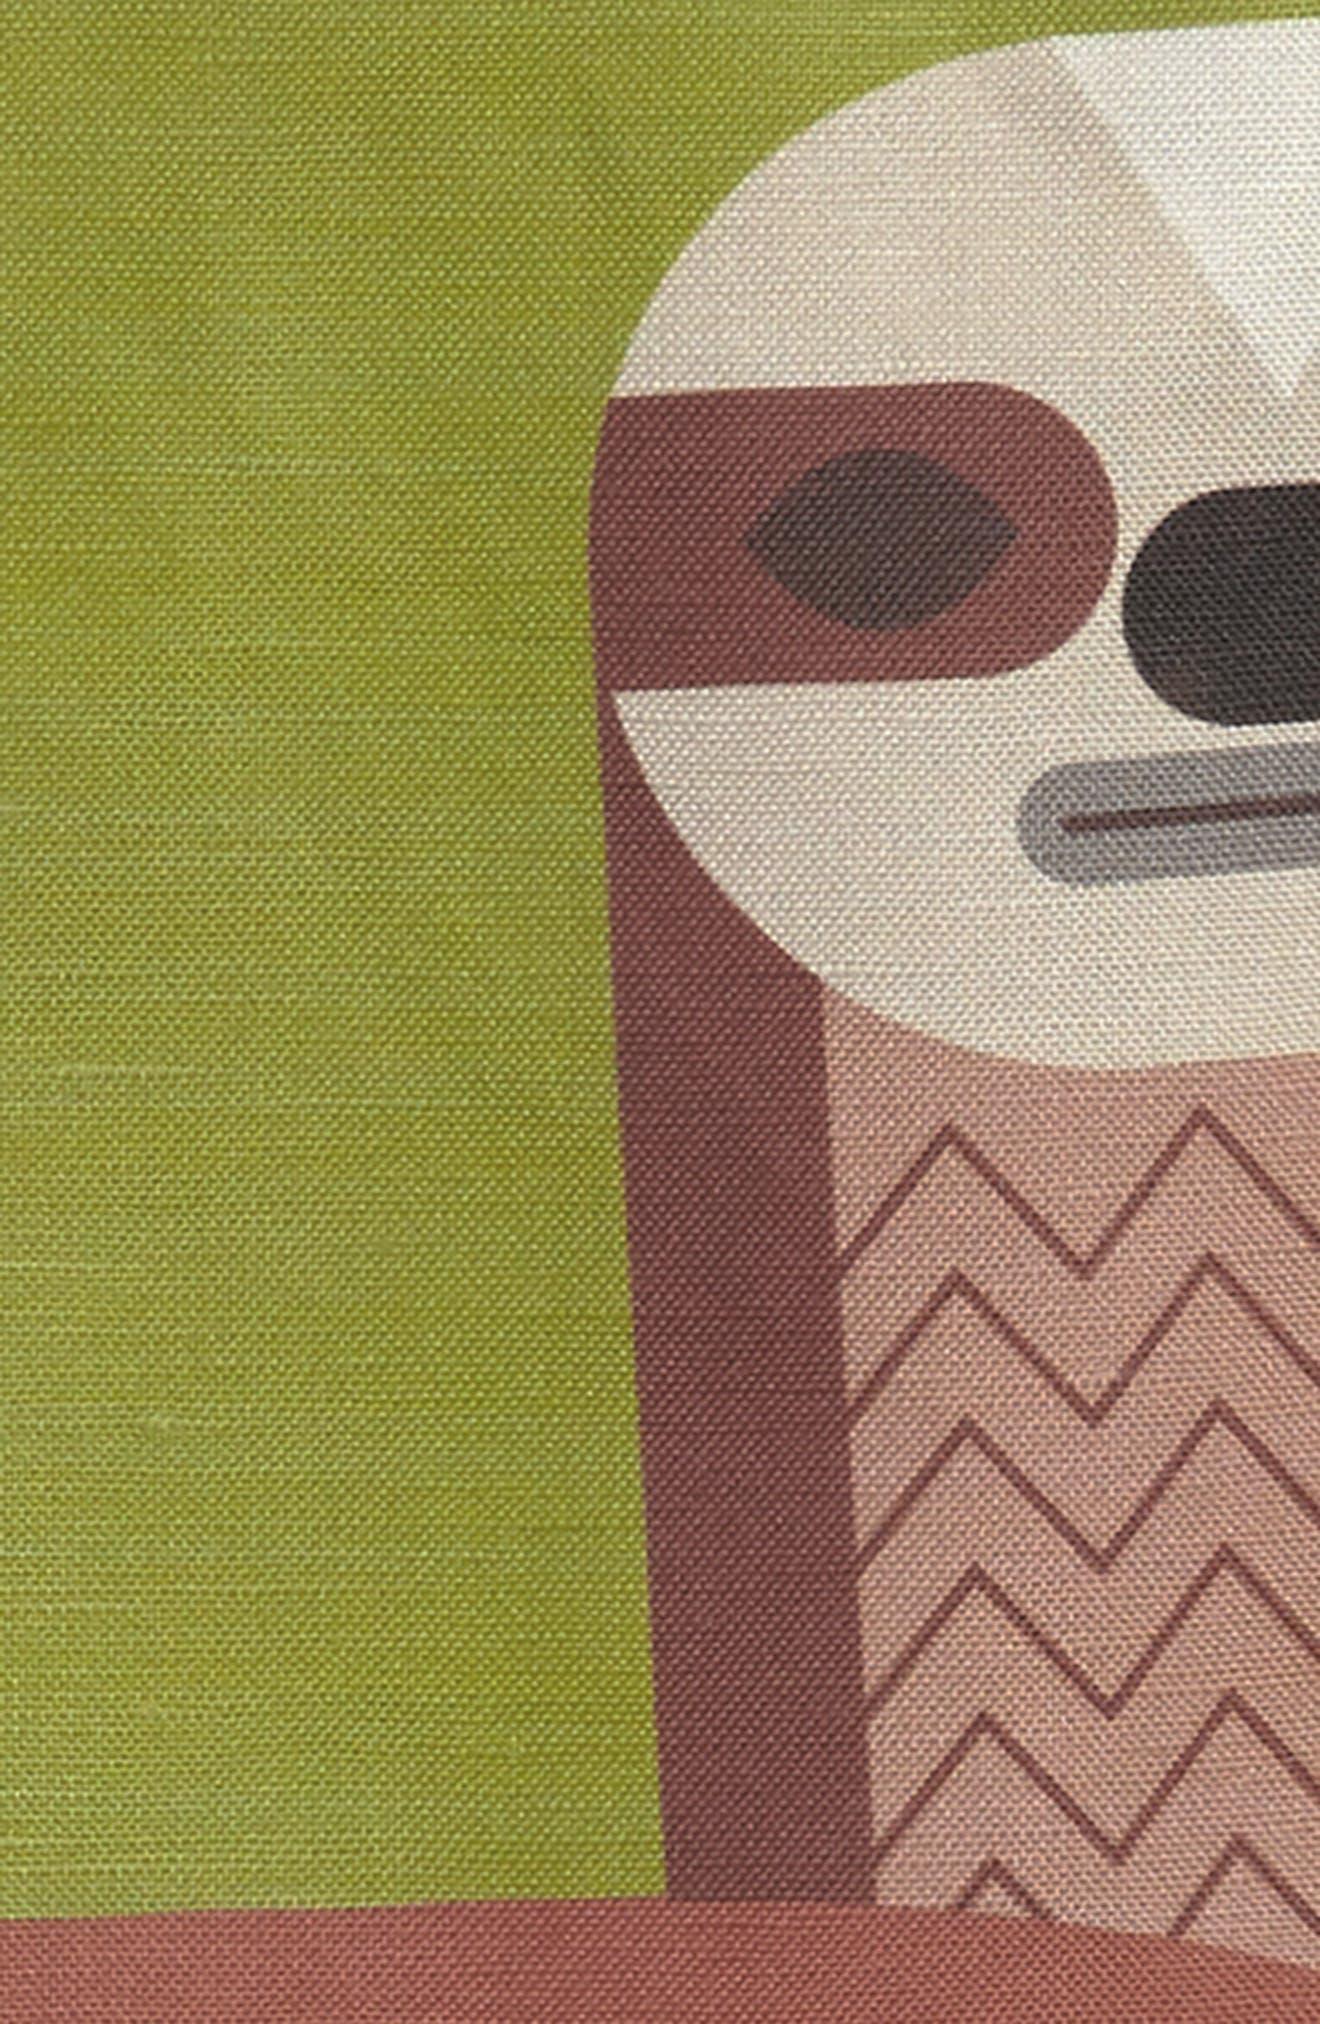 Alternate Image 3  - Kid Made Modern Sloth Shift Dress (Little Girls & Big Girls)